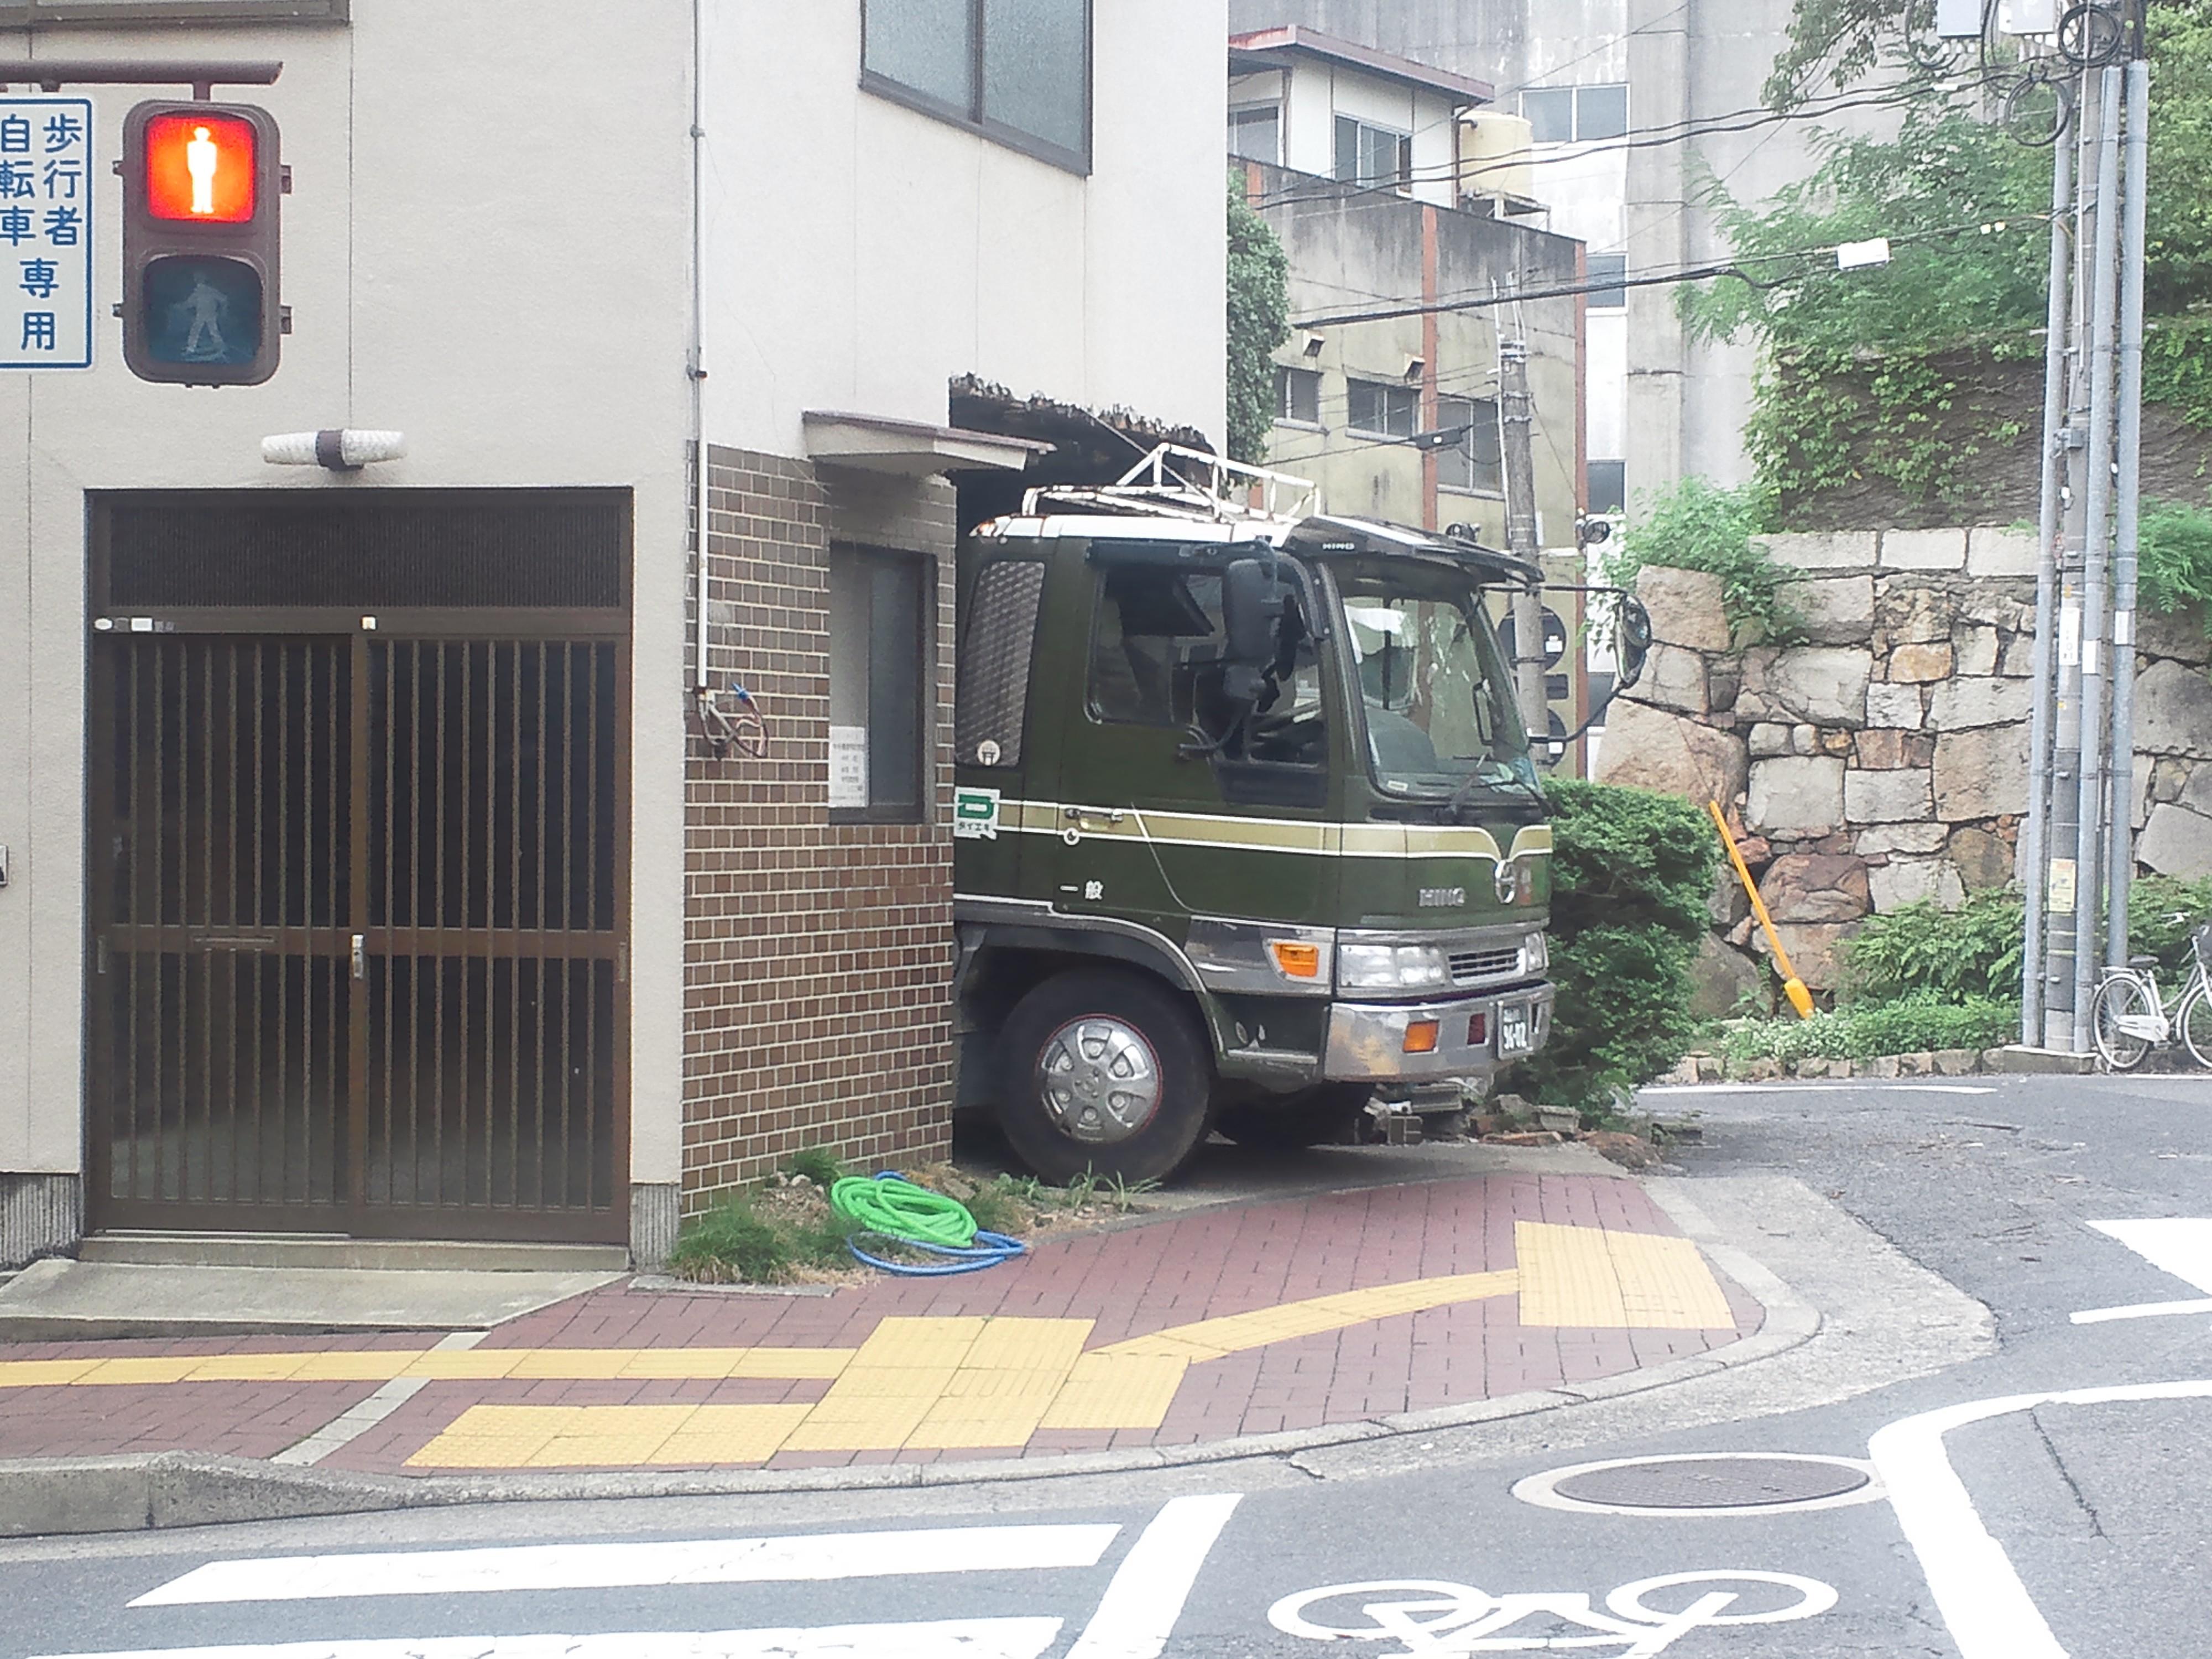 http://www.t-ueda.jp/myblog/DSC_0002.JPG